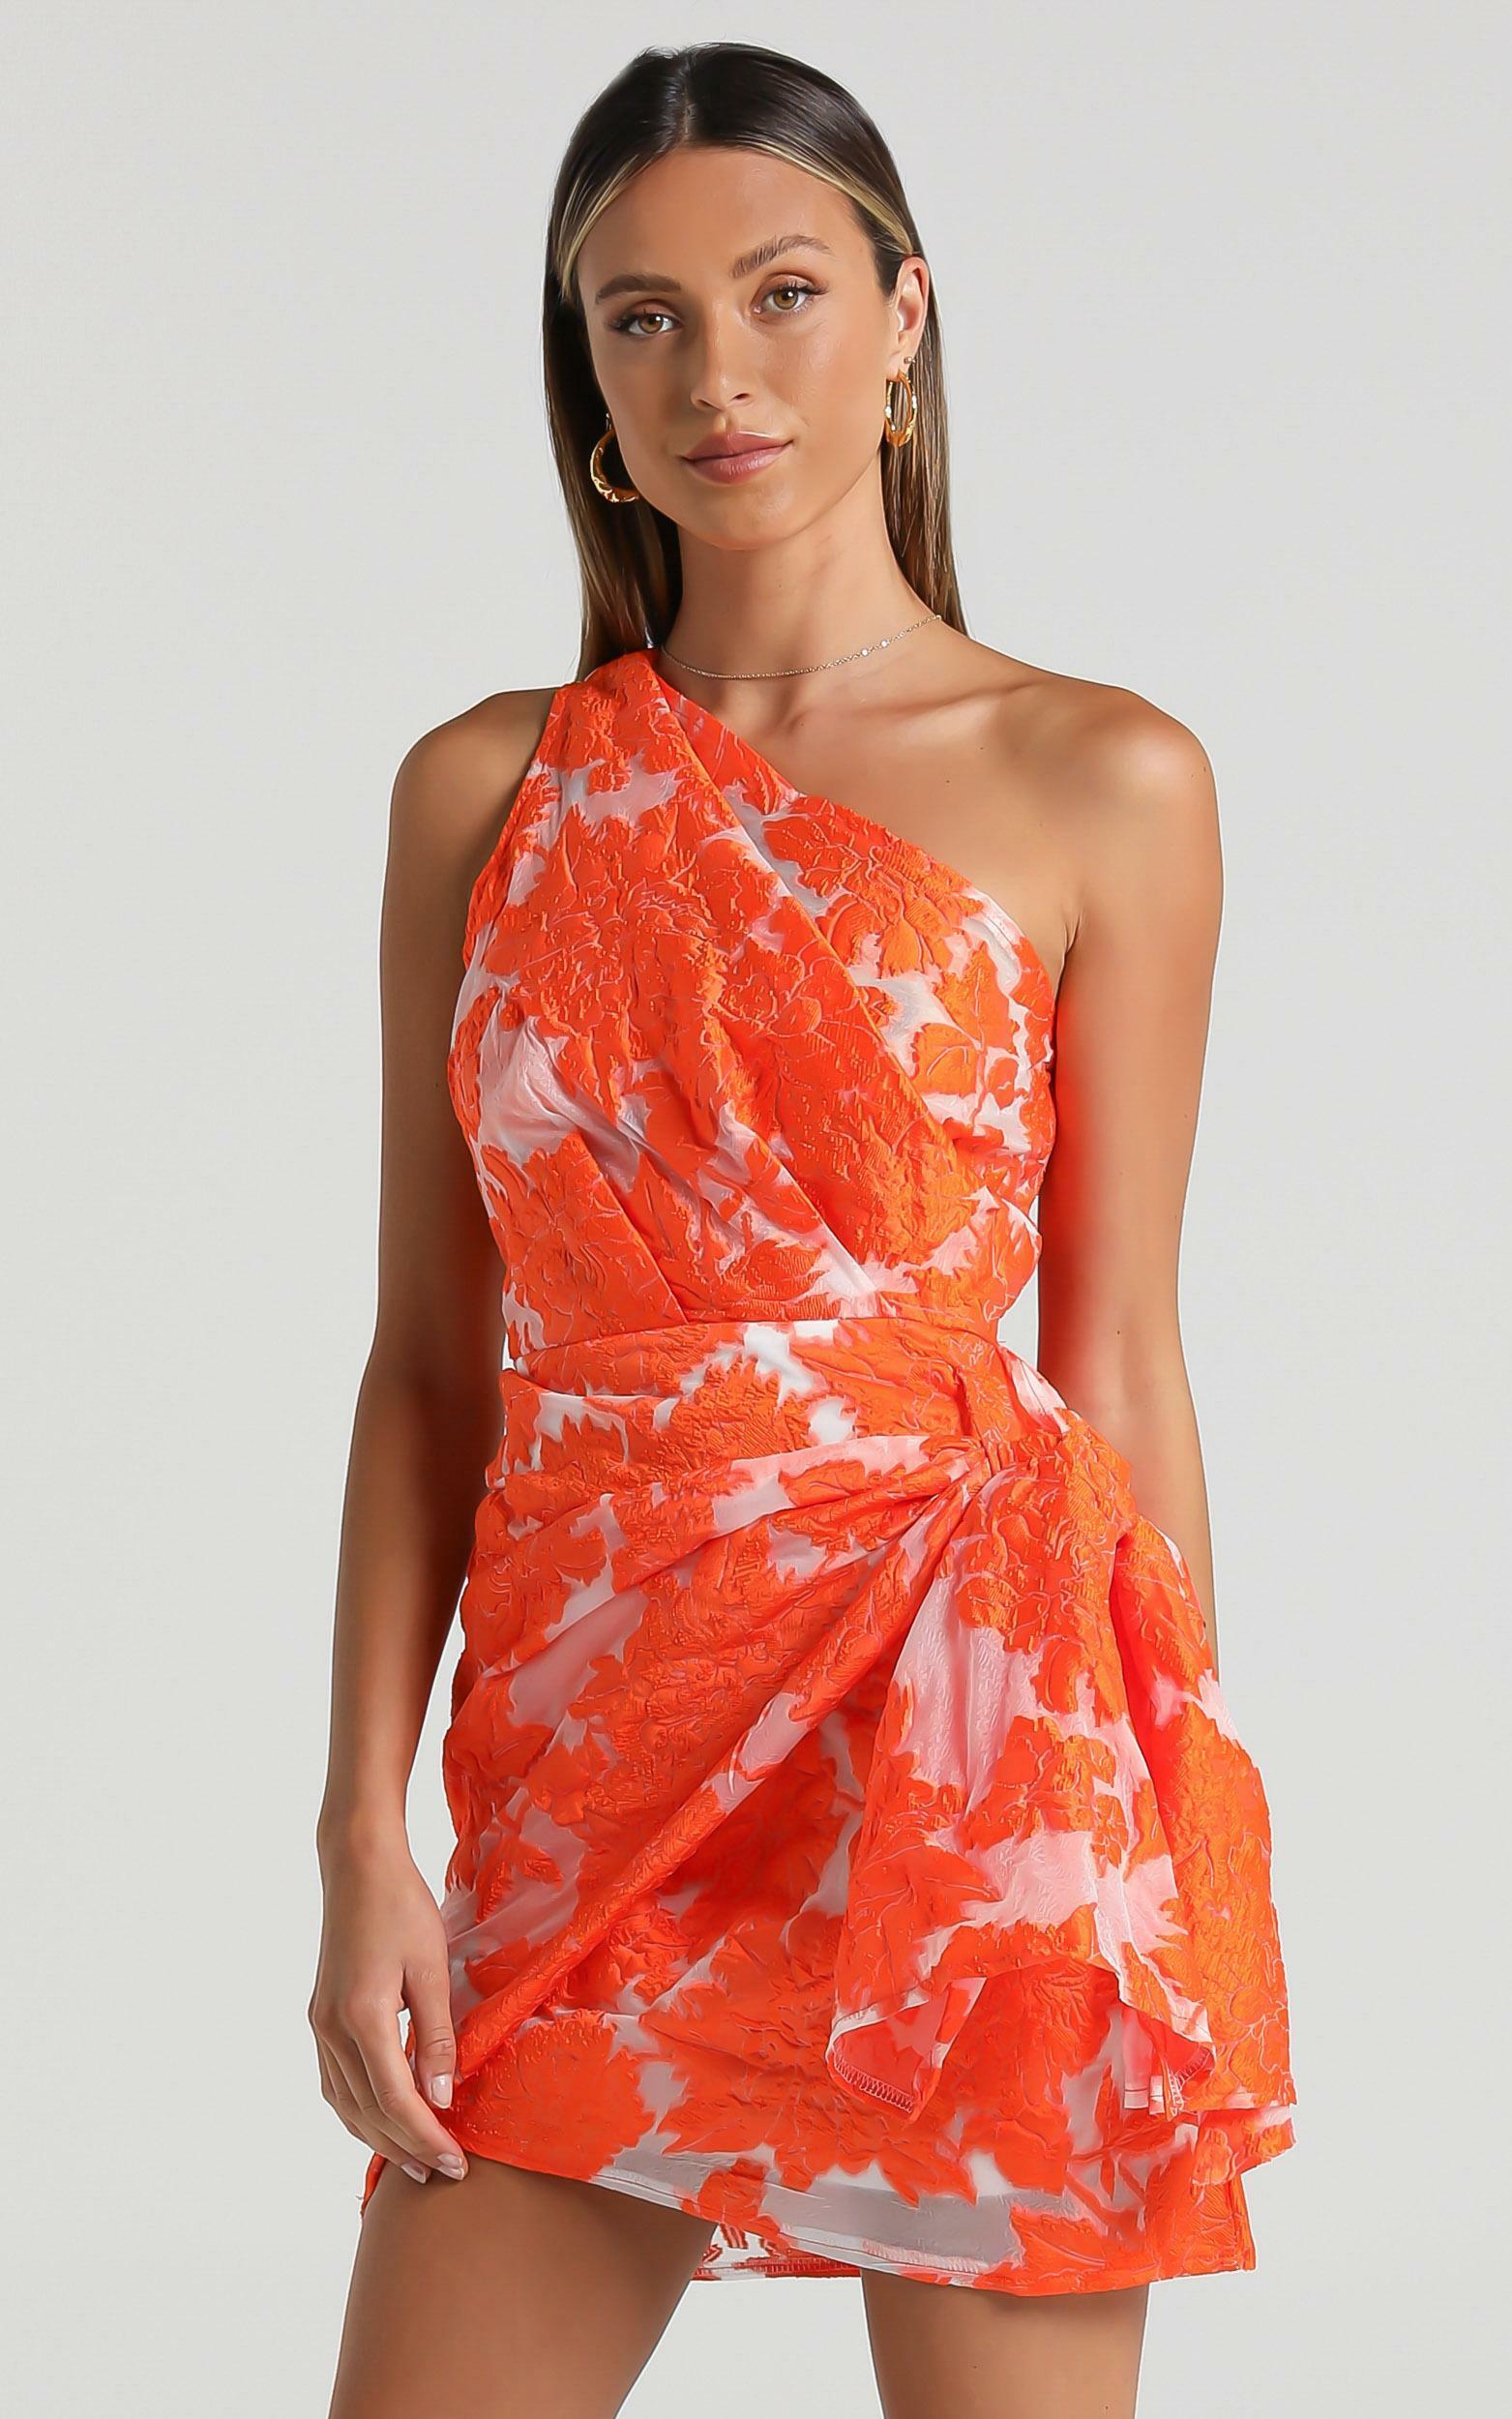 Brailey Dress in Orange Floral - 06, ORG1, hi-res image number null